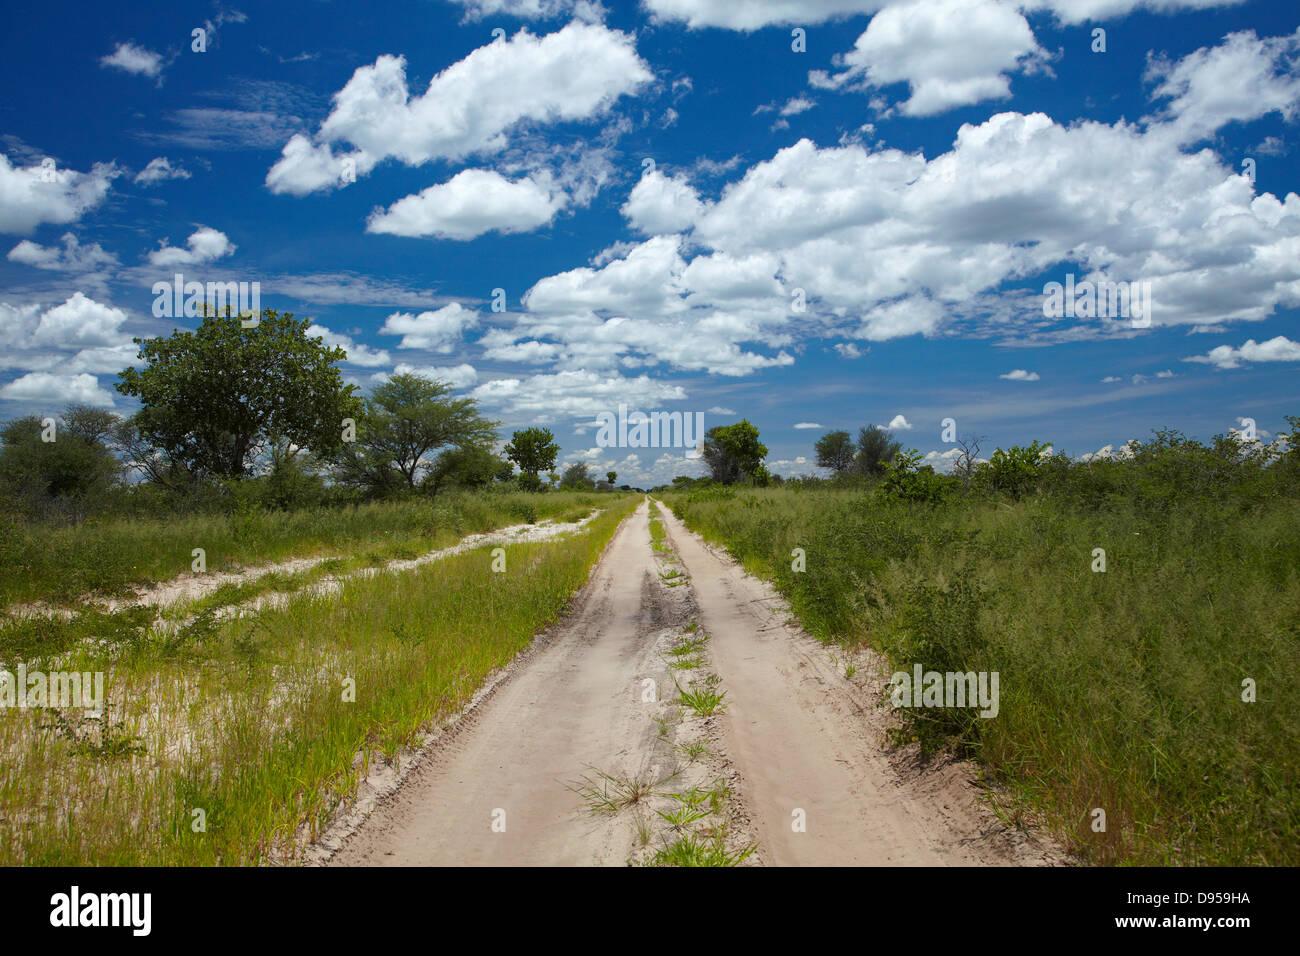 Track from Dobe Border to Nokaneng, North-western Botswana, Africa - Stock Image